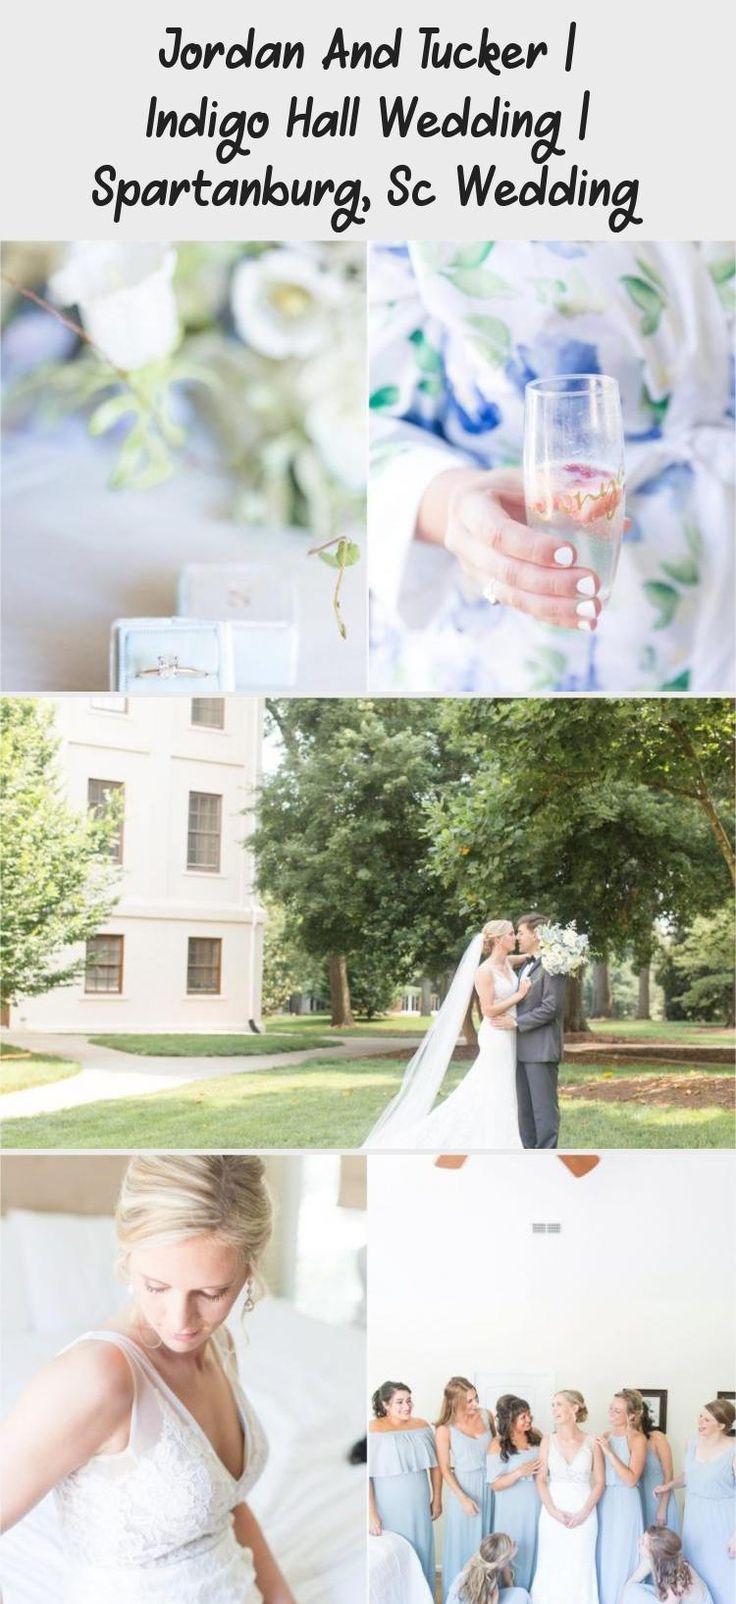 Indigo Hall Spartanburg Wedding | Greenville, SC Wedding Photographer | Christa Rene Photography